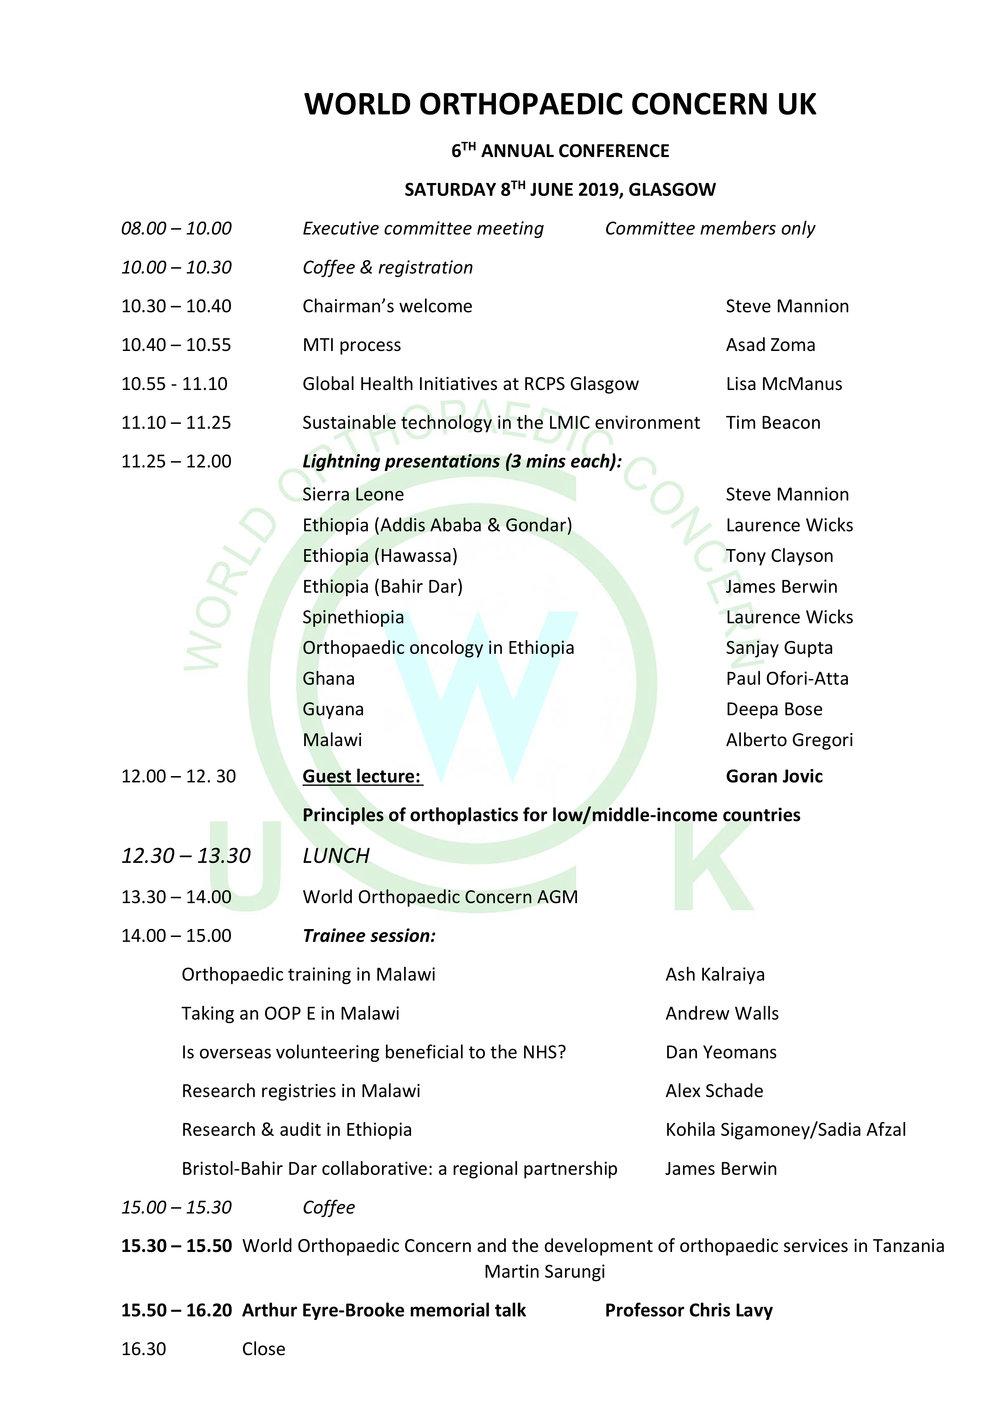 WOC UK 2019 conference.jpg